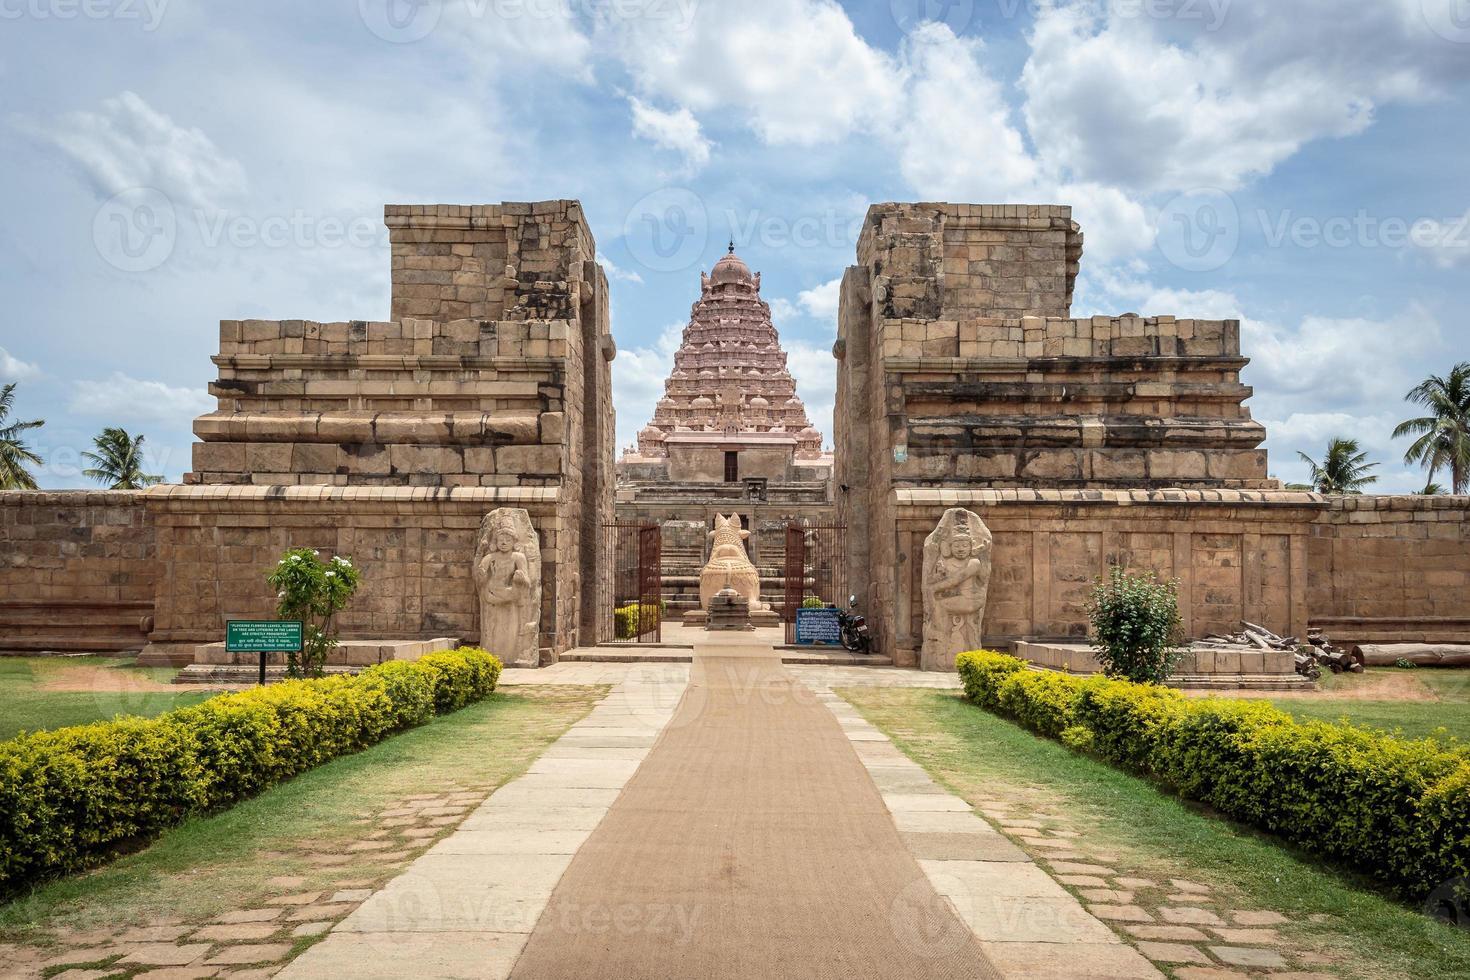 oude hindoetempel in Zuid-India foto